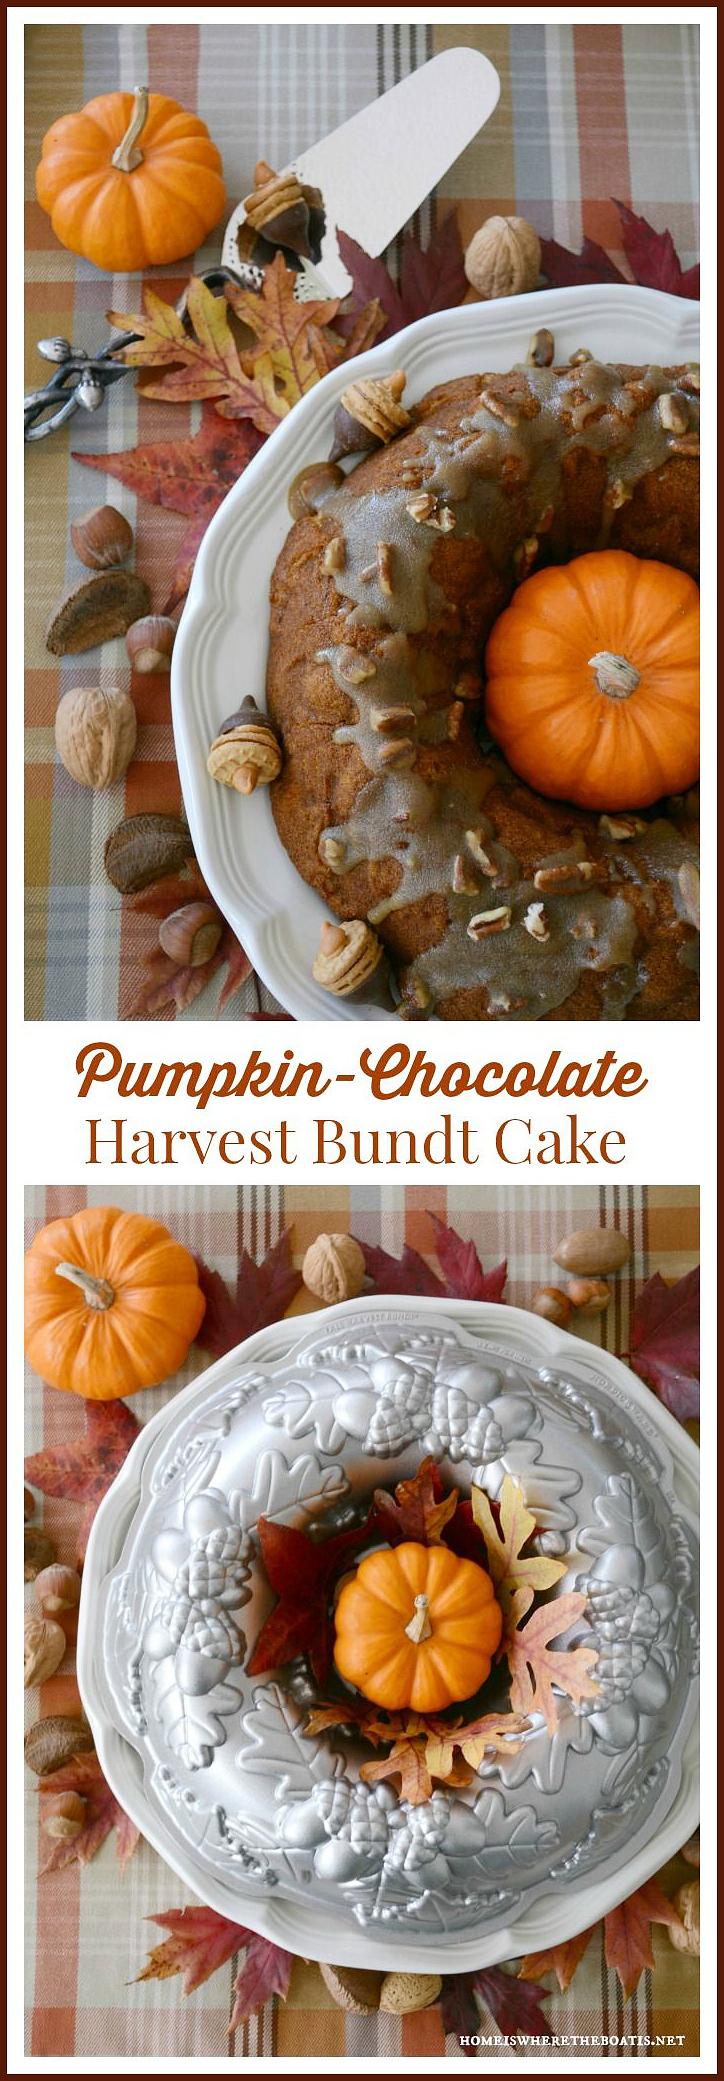 Pumpkin-Chocolate Harvest Cake with Bourbon-Pecan Glaze | ©homeiswheretheboatis.net #cake #bundt #pumpkin #bourbon #chocolate